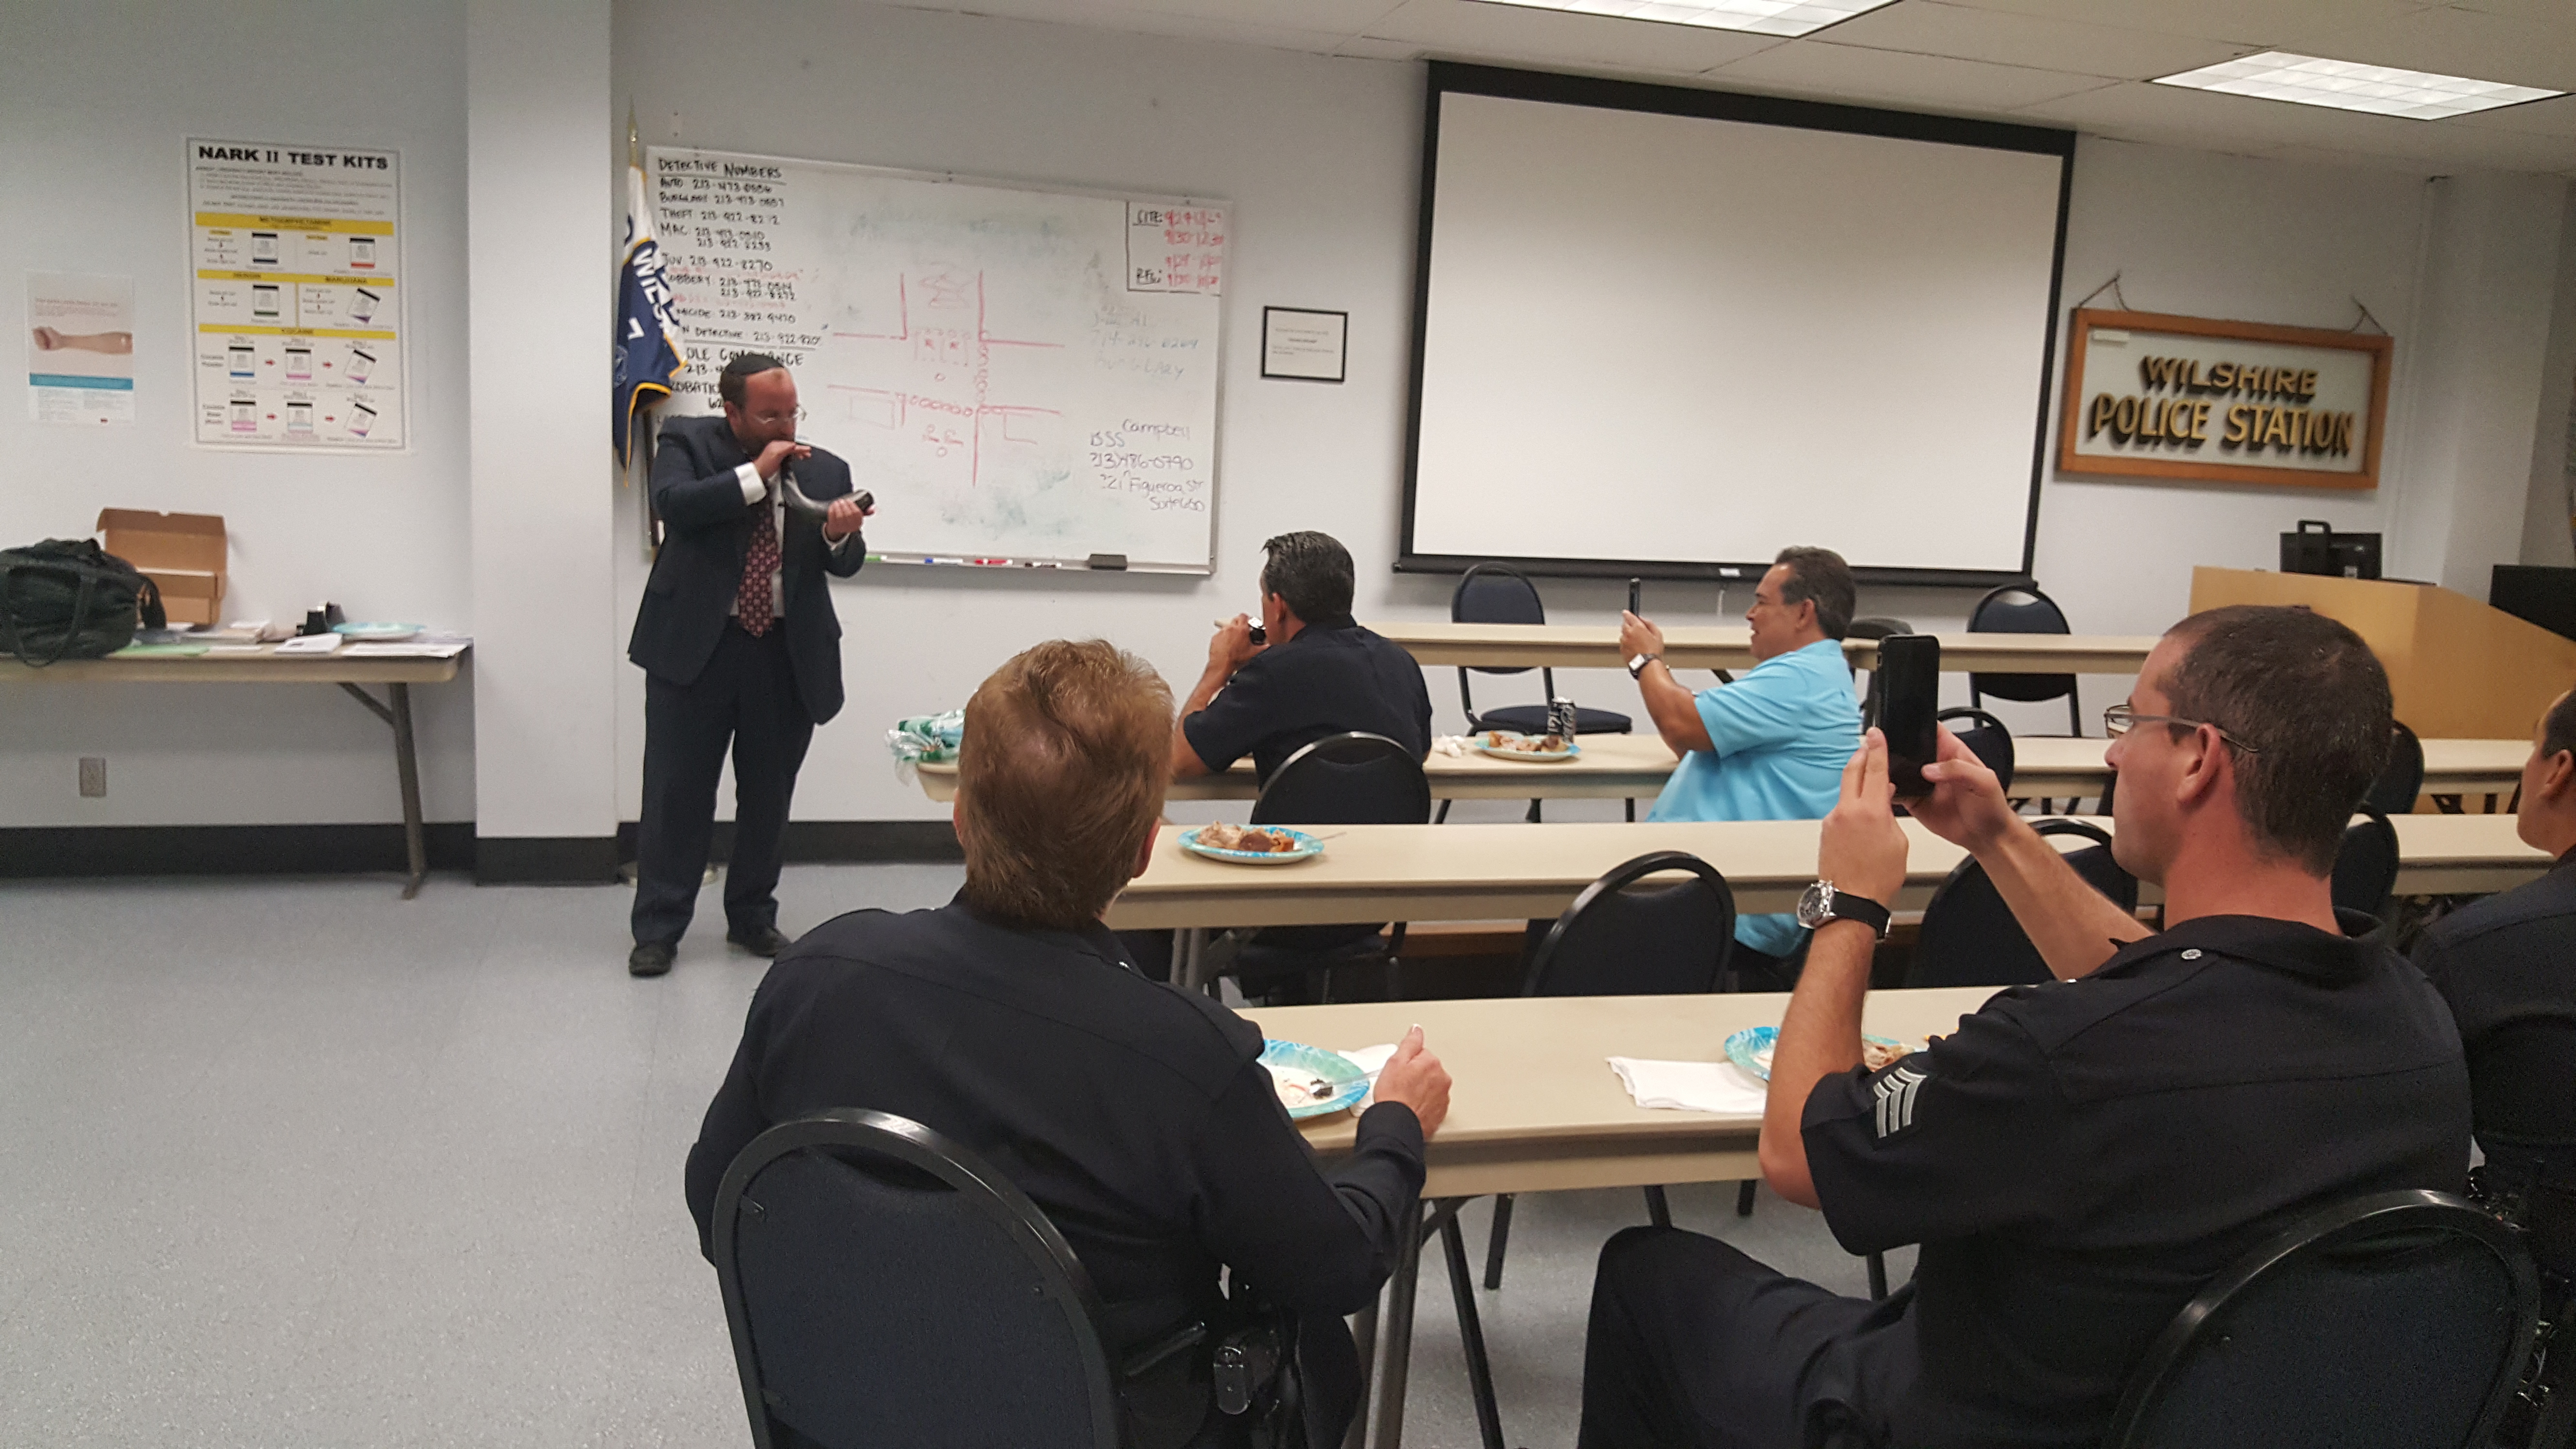 Rabbi Einhorn Shares Rosh Hashanah Greetings with LAPD Wilshire